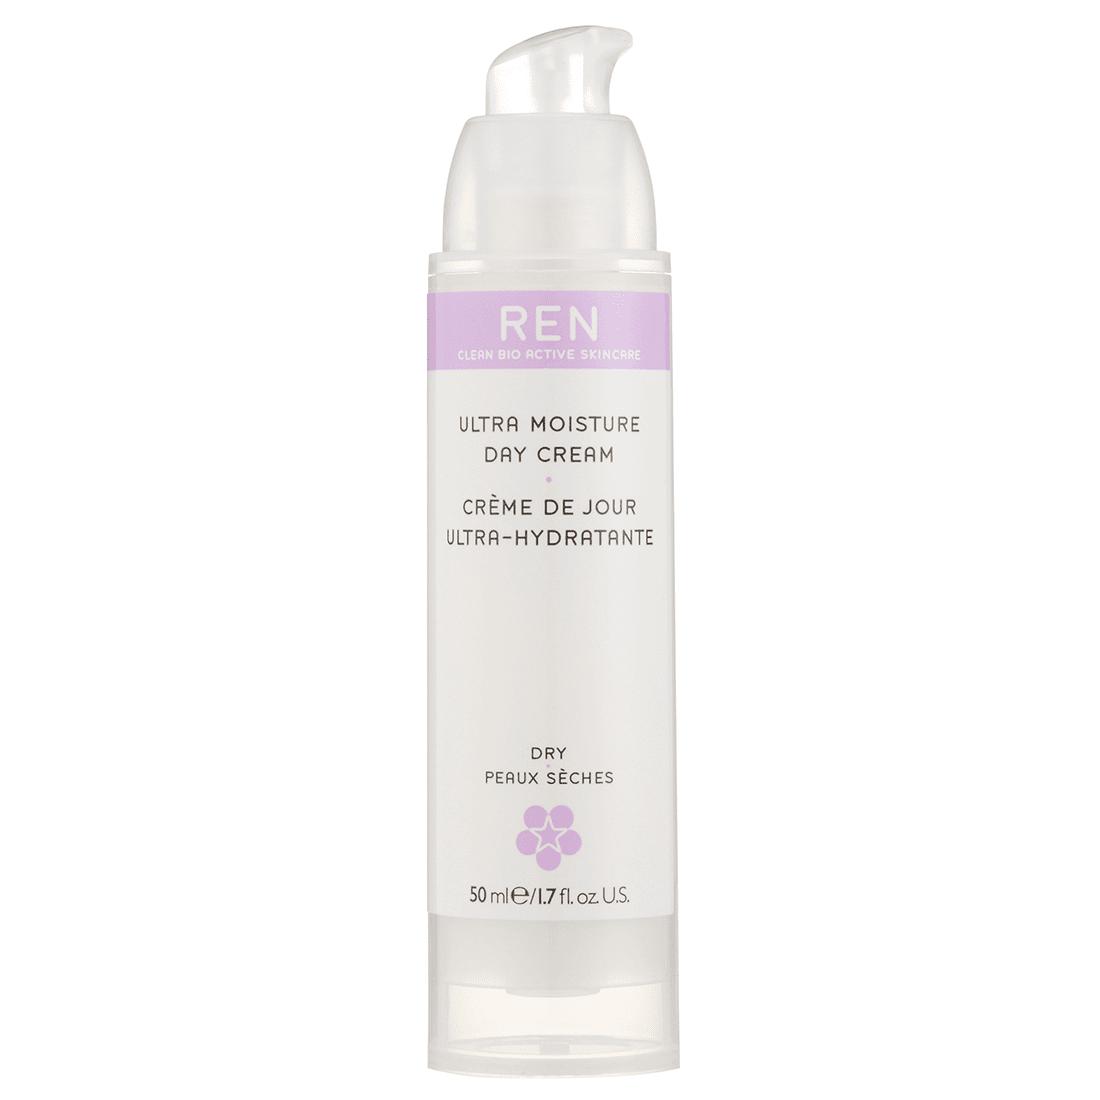 ren_ultra_moisture_day_cream